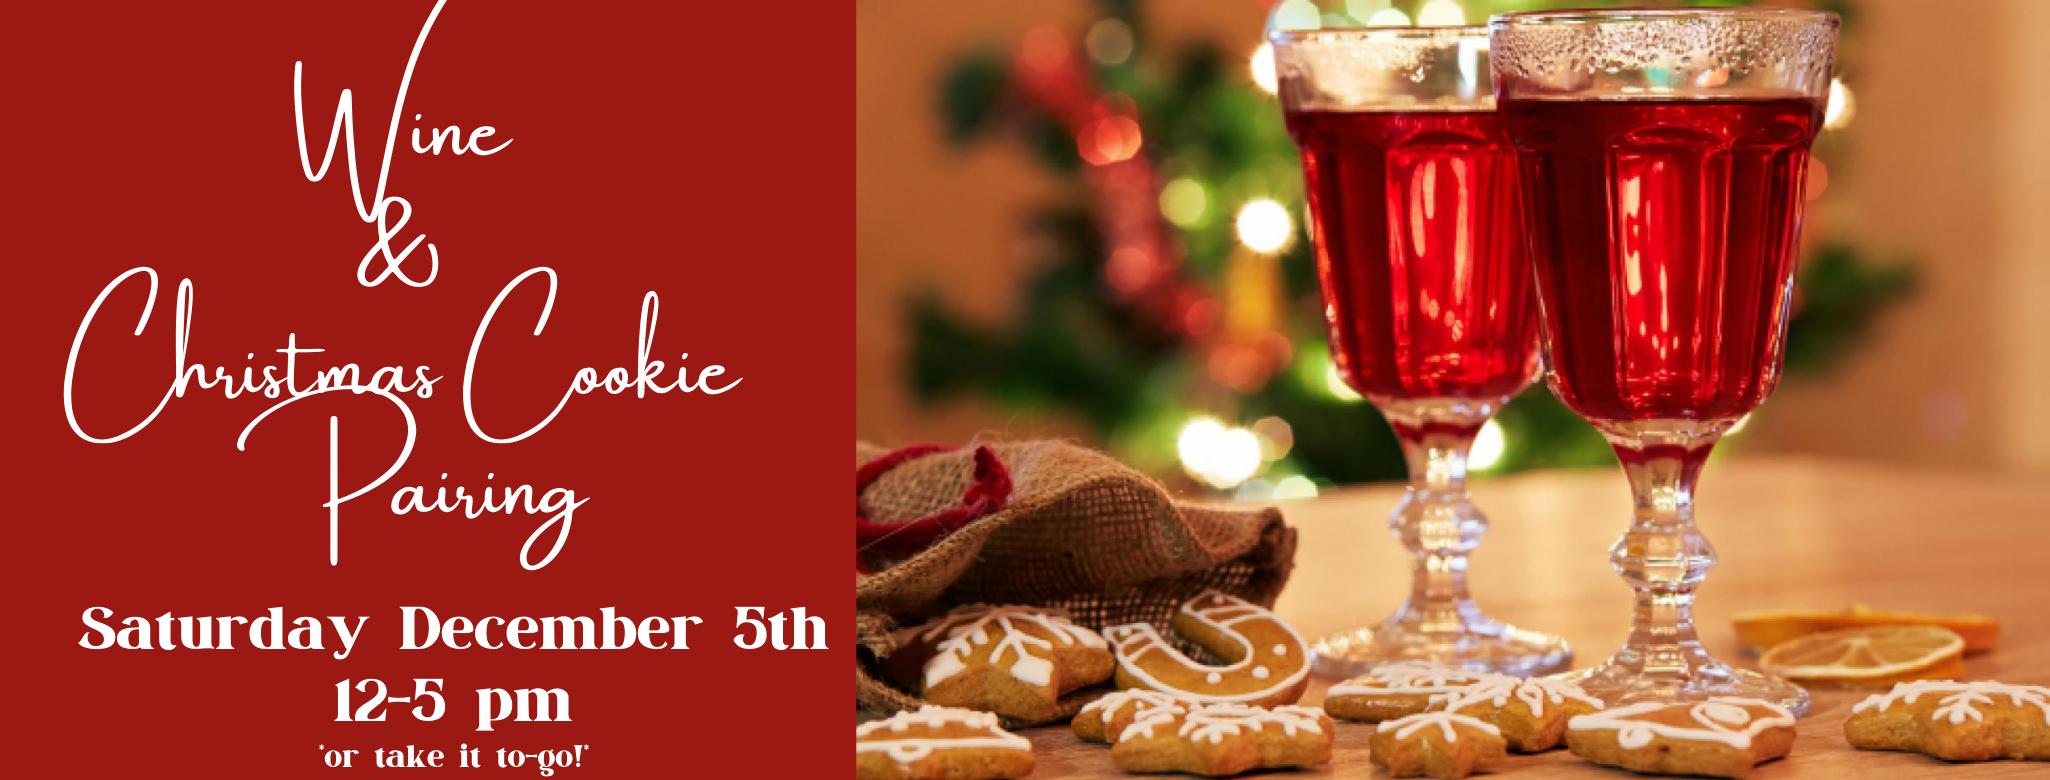 Wine & Christmas Cookie Pairing